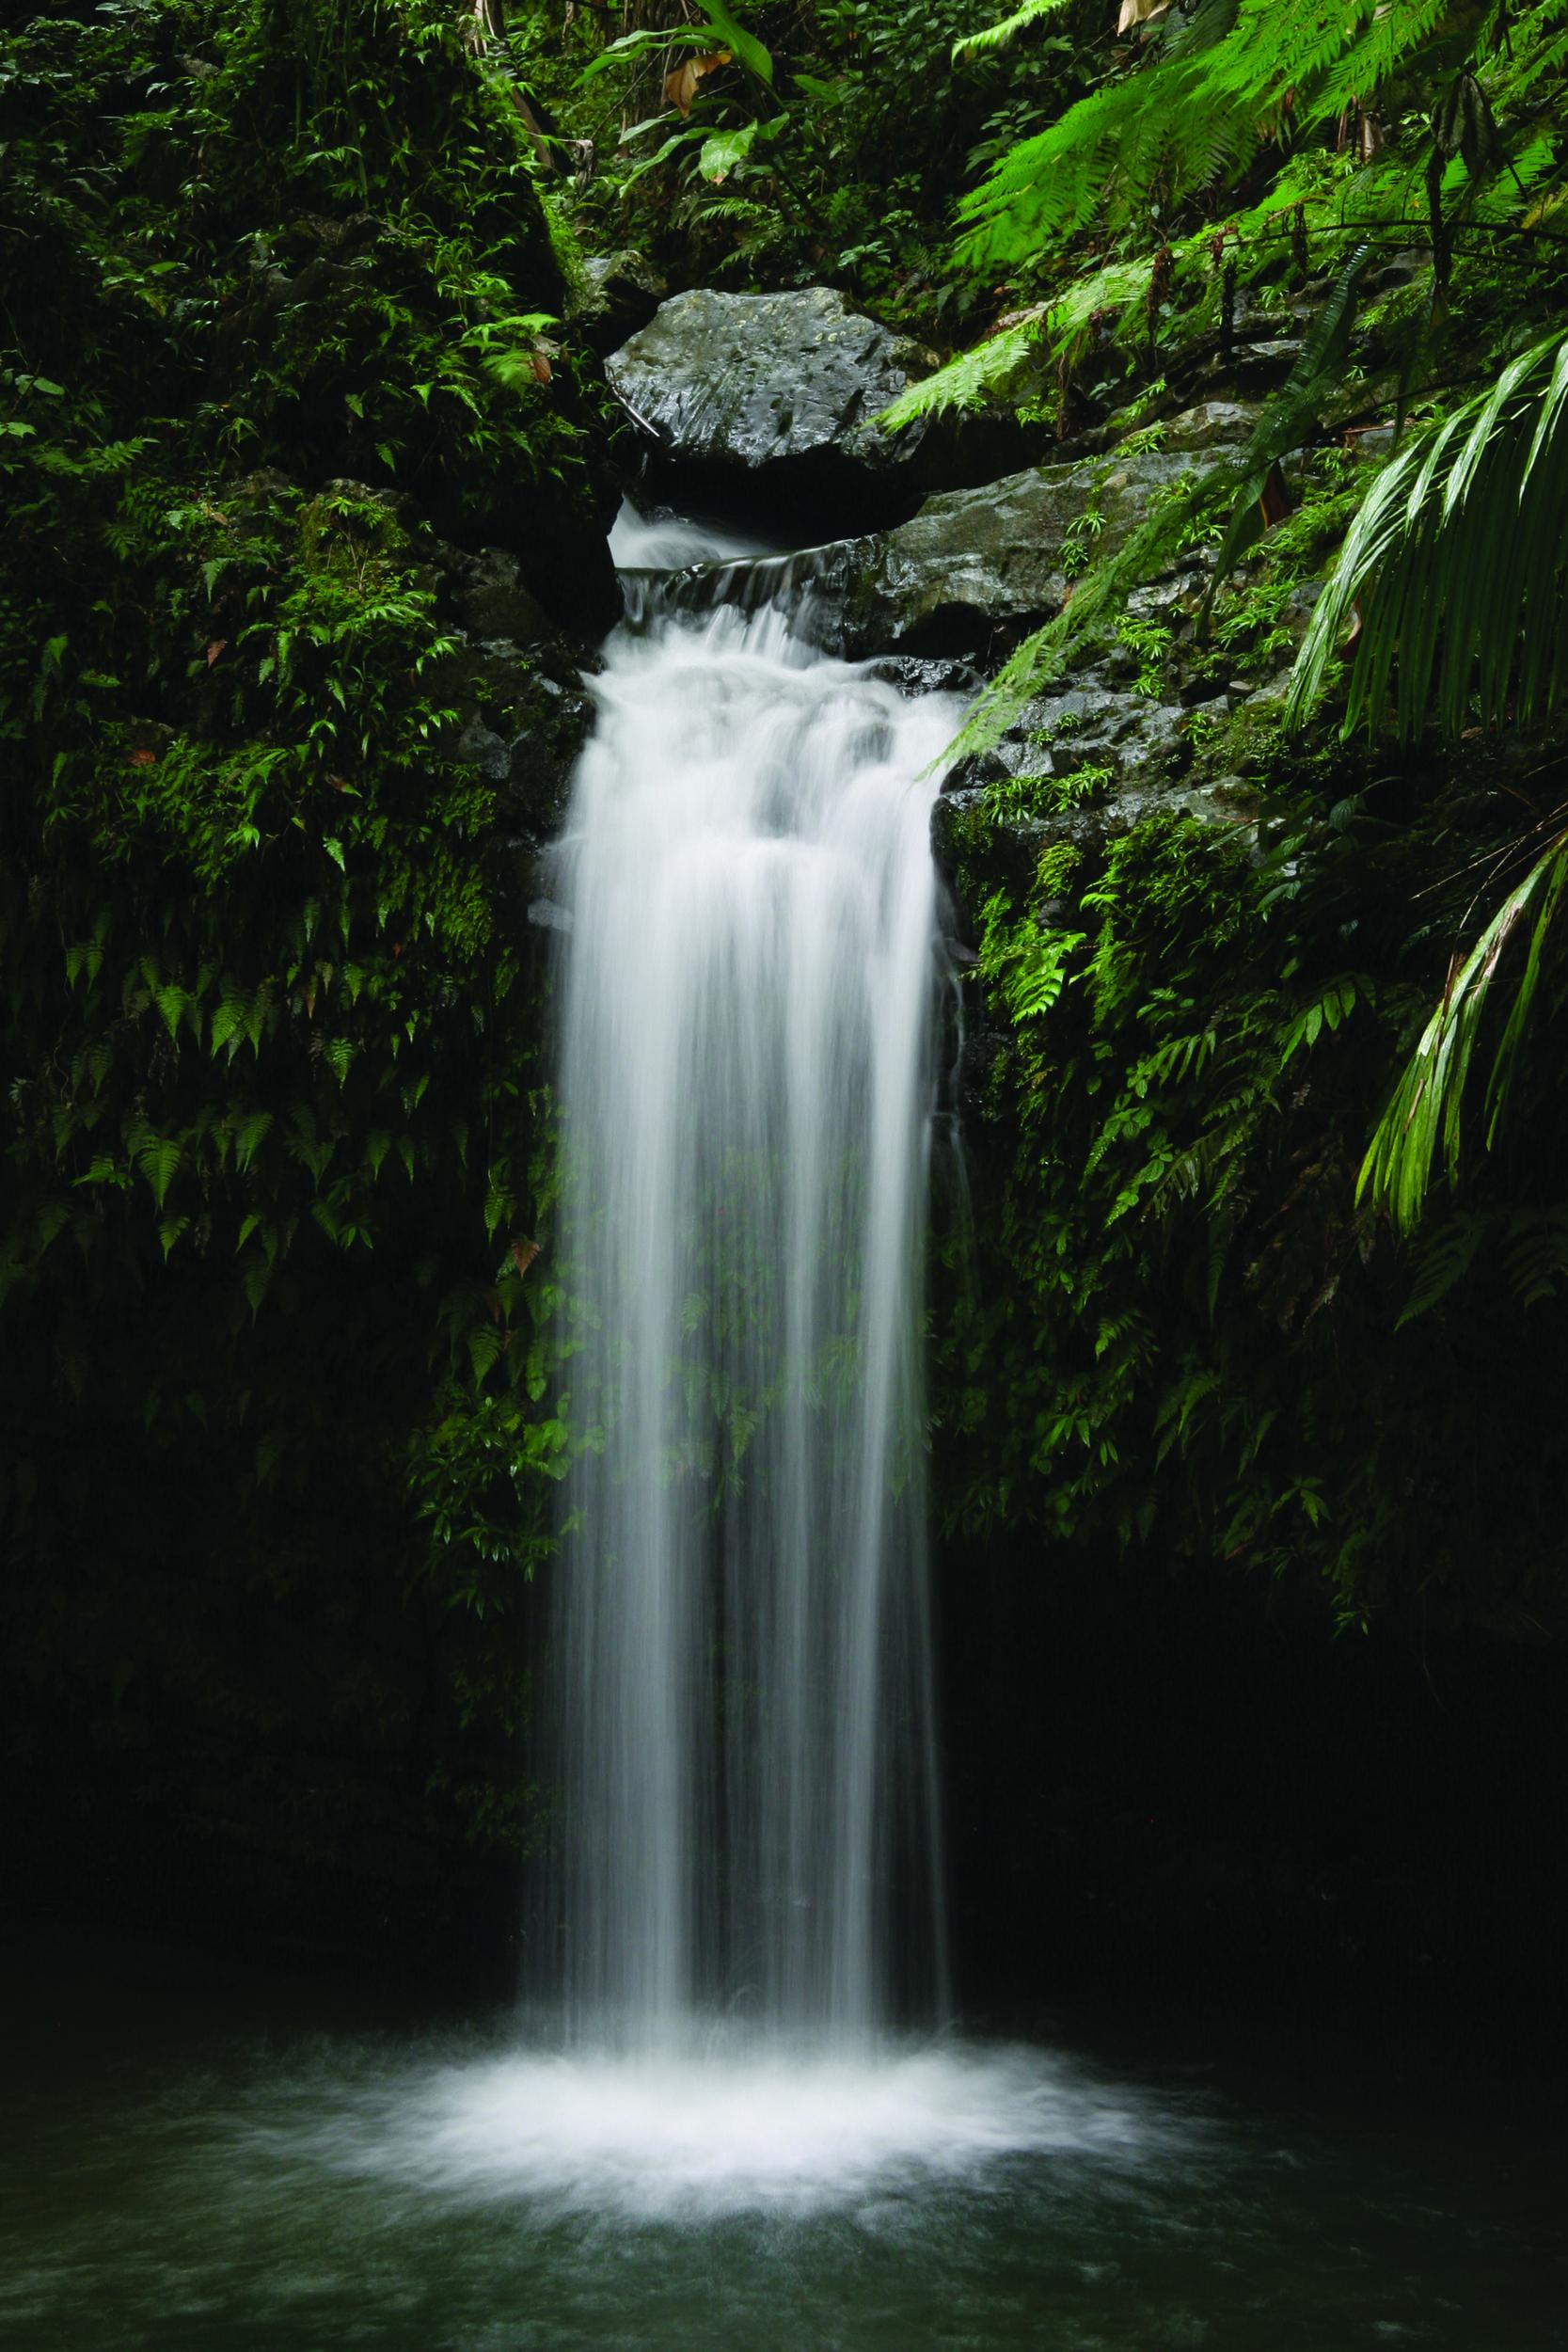 El Yunque, Puerto Rico. Puerto Rico itinerary: Things to do in Old San Juan